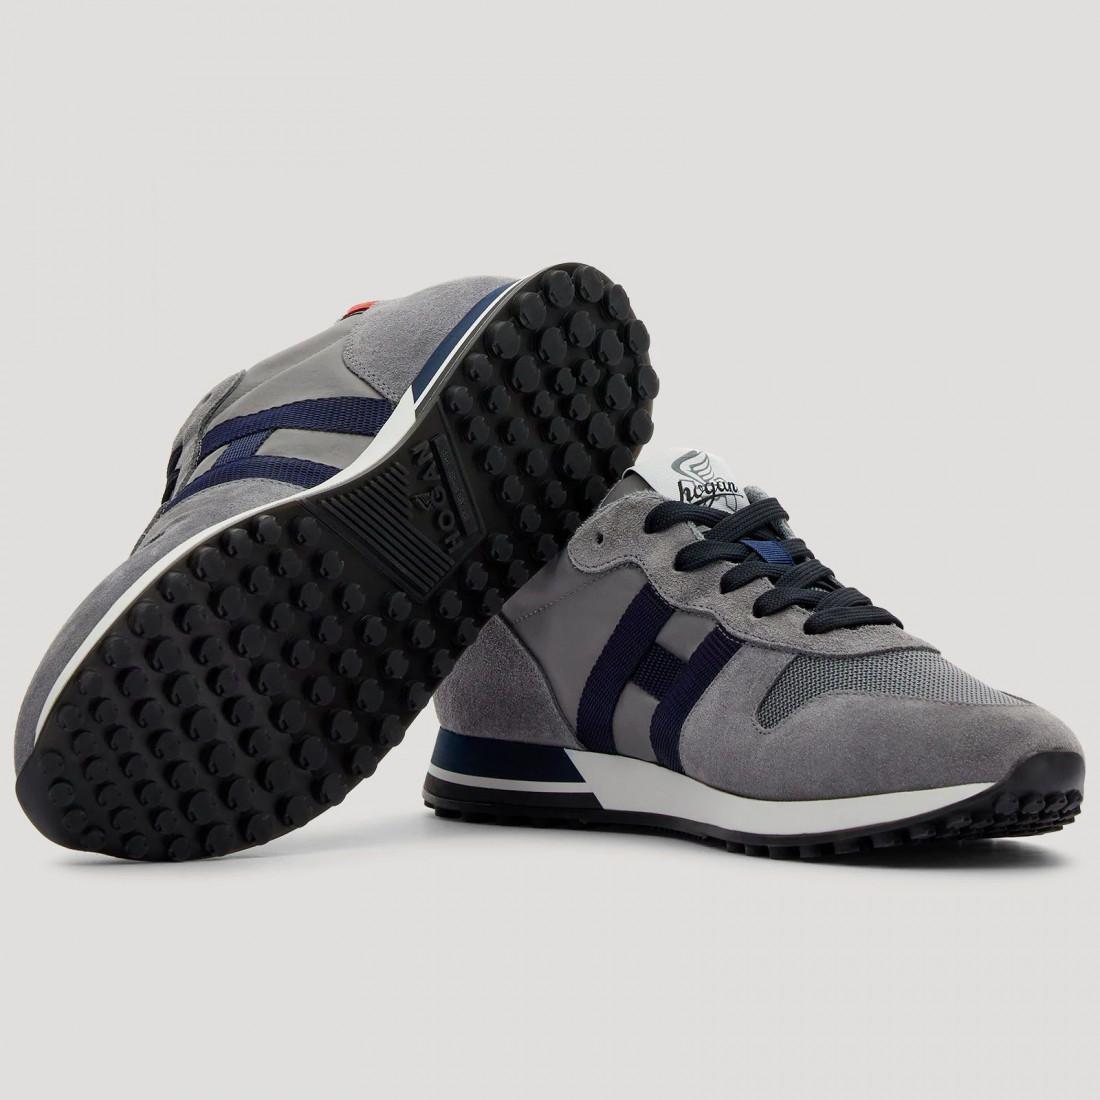 sneakers uomo hogan hxm3830an51jhm50cs 8174